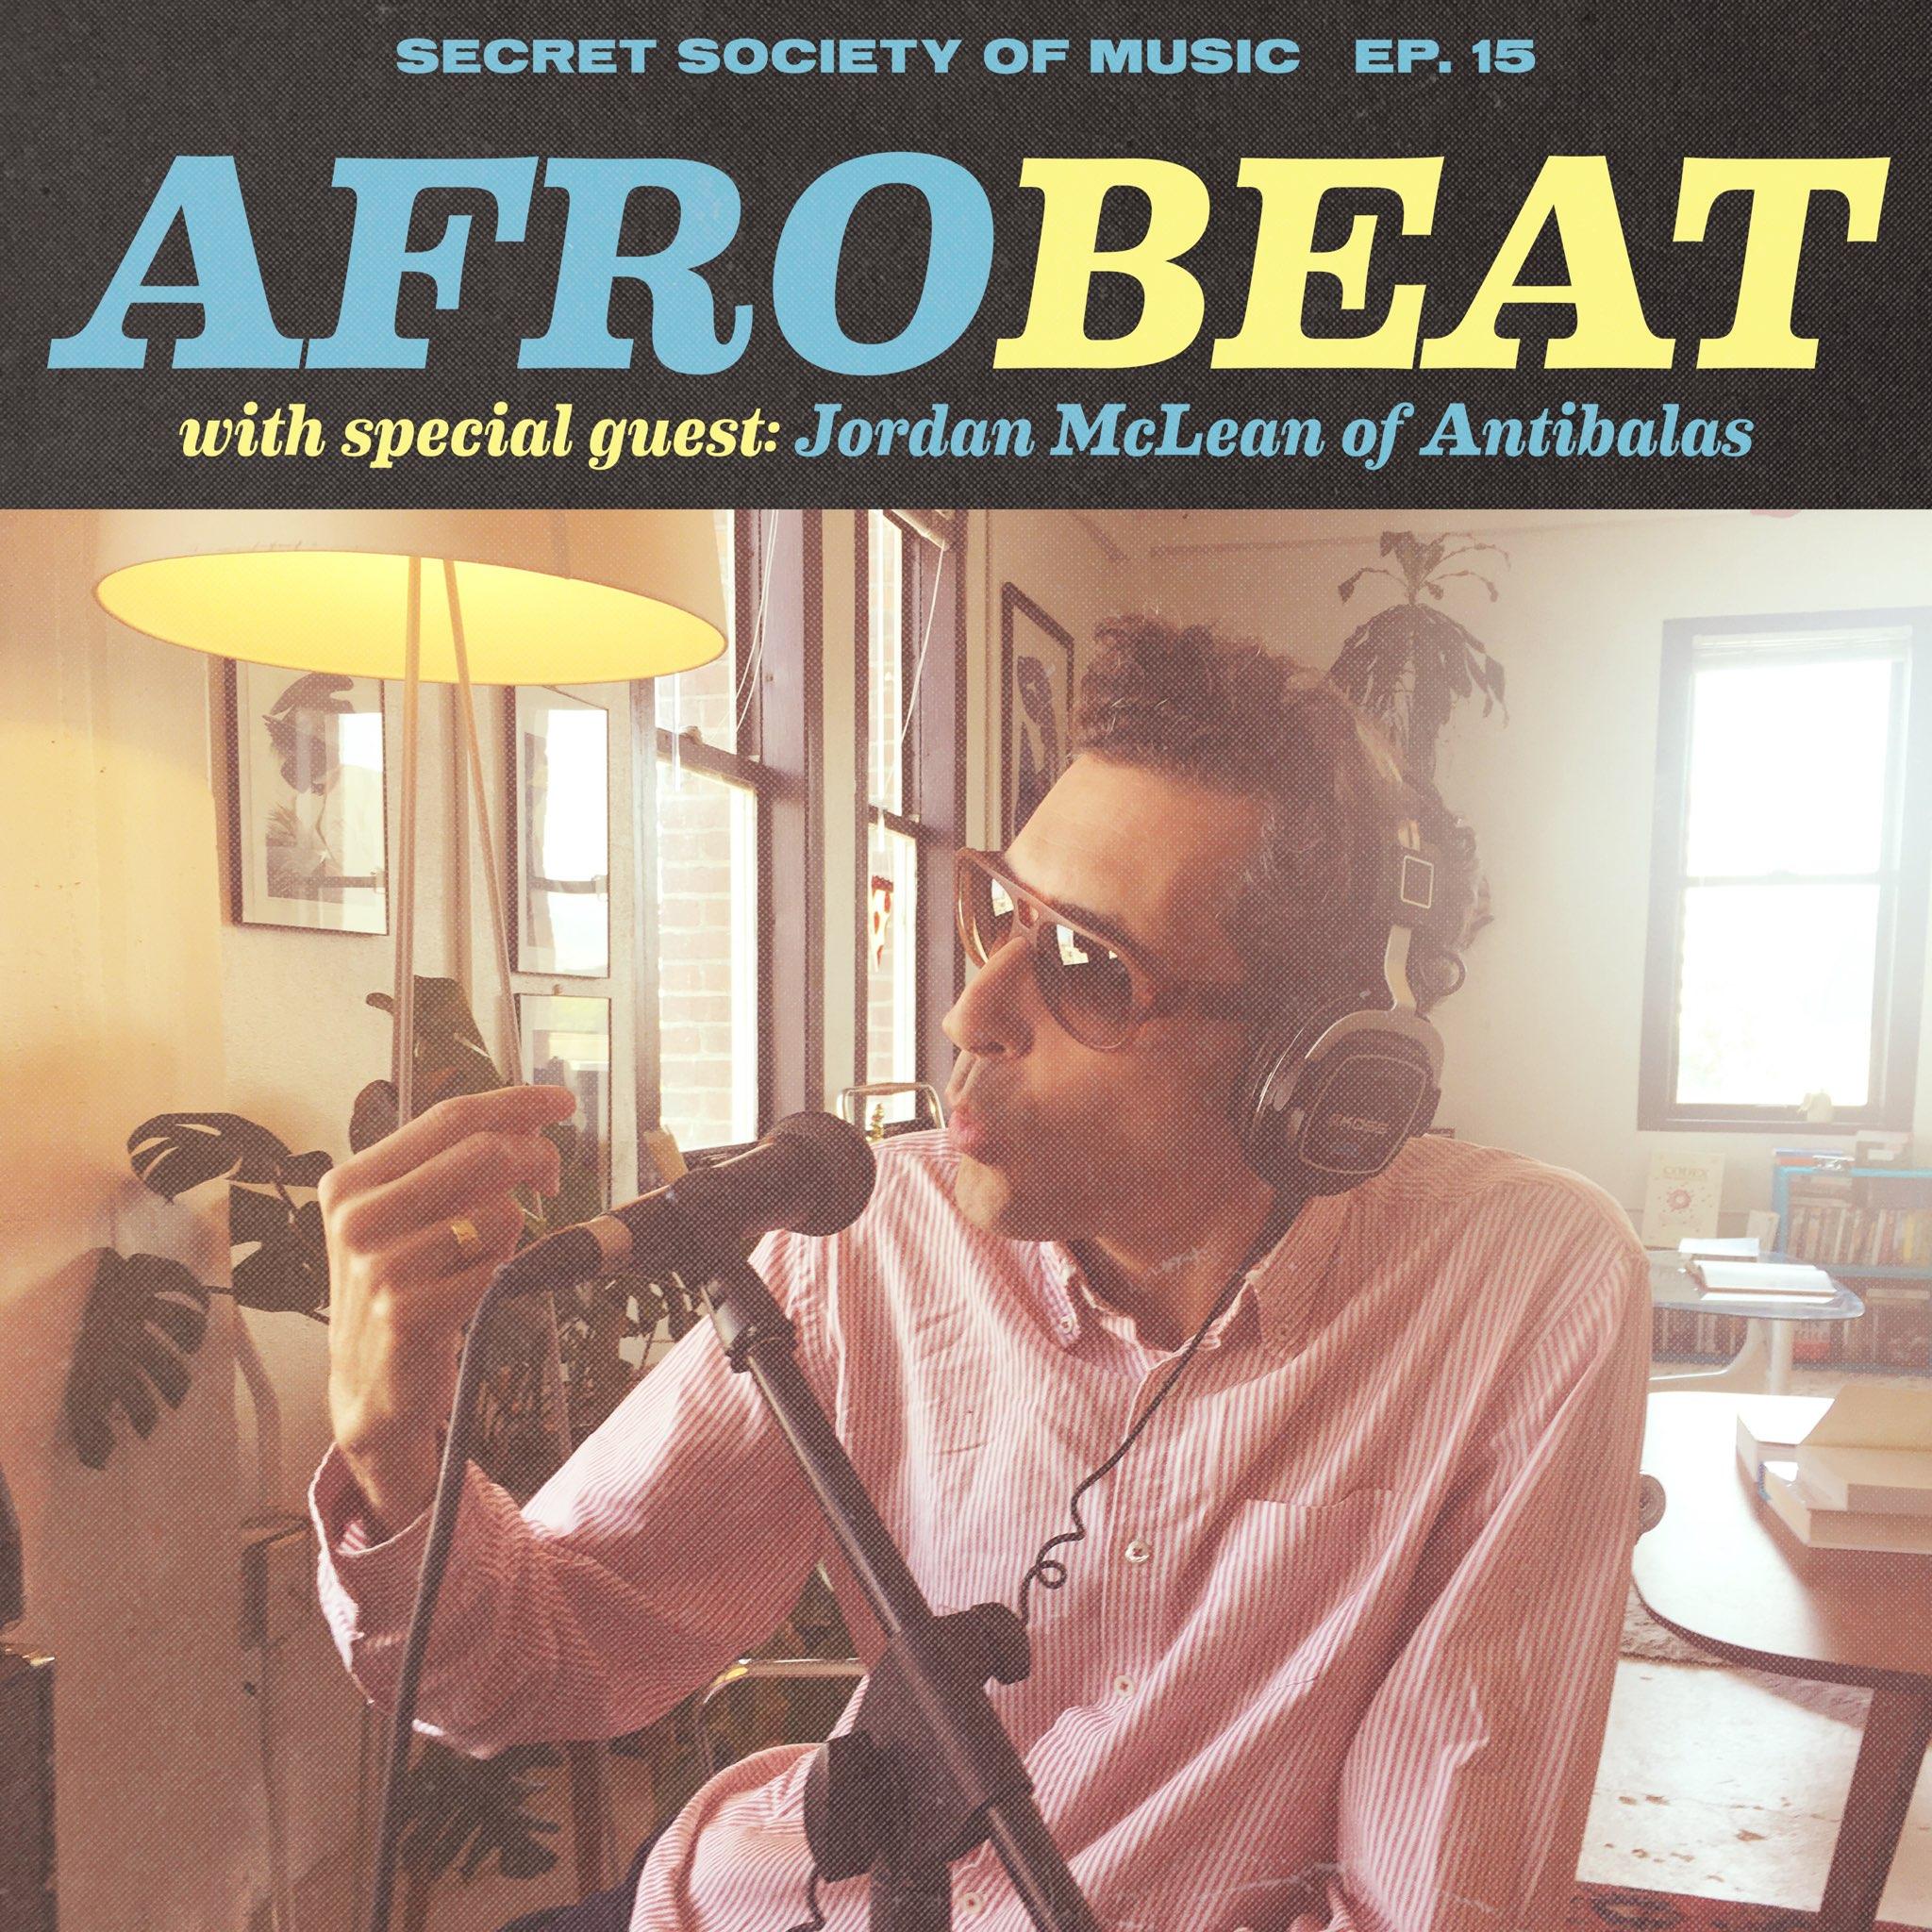 Secret Society Of Music #15 / Afrobeat